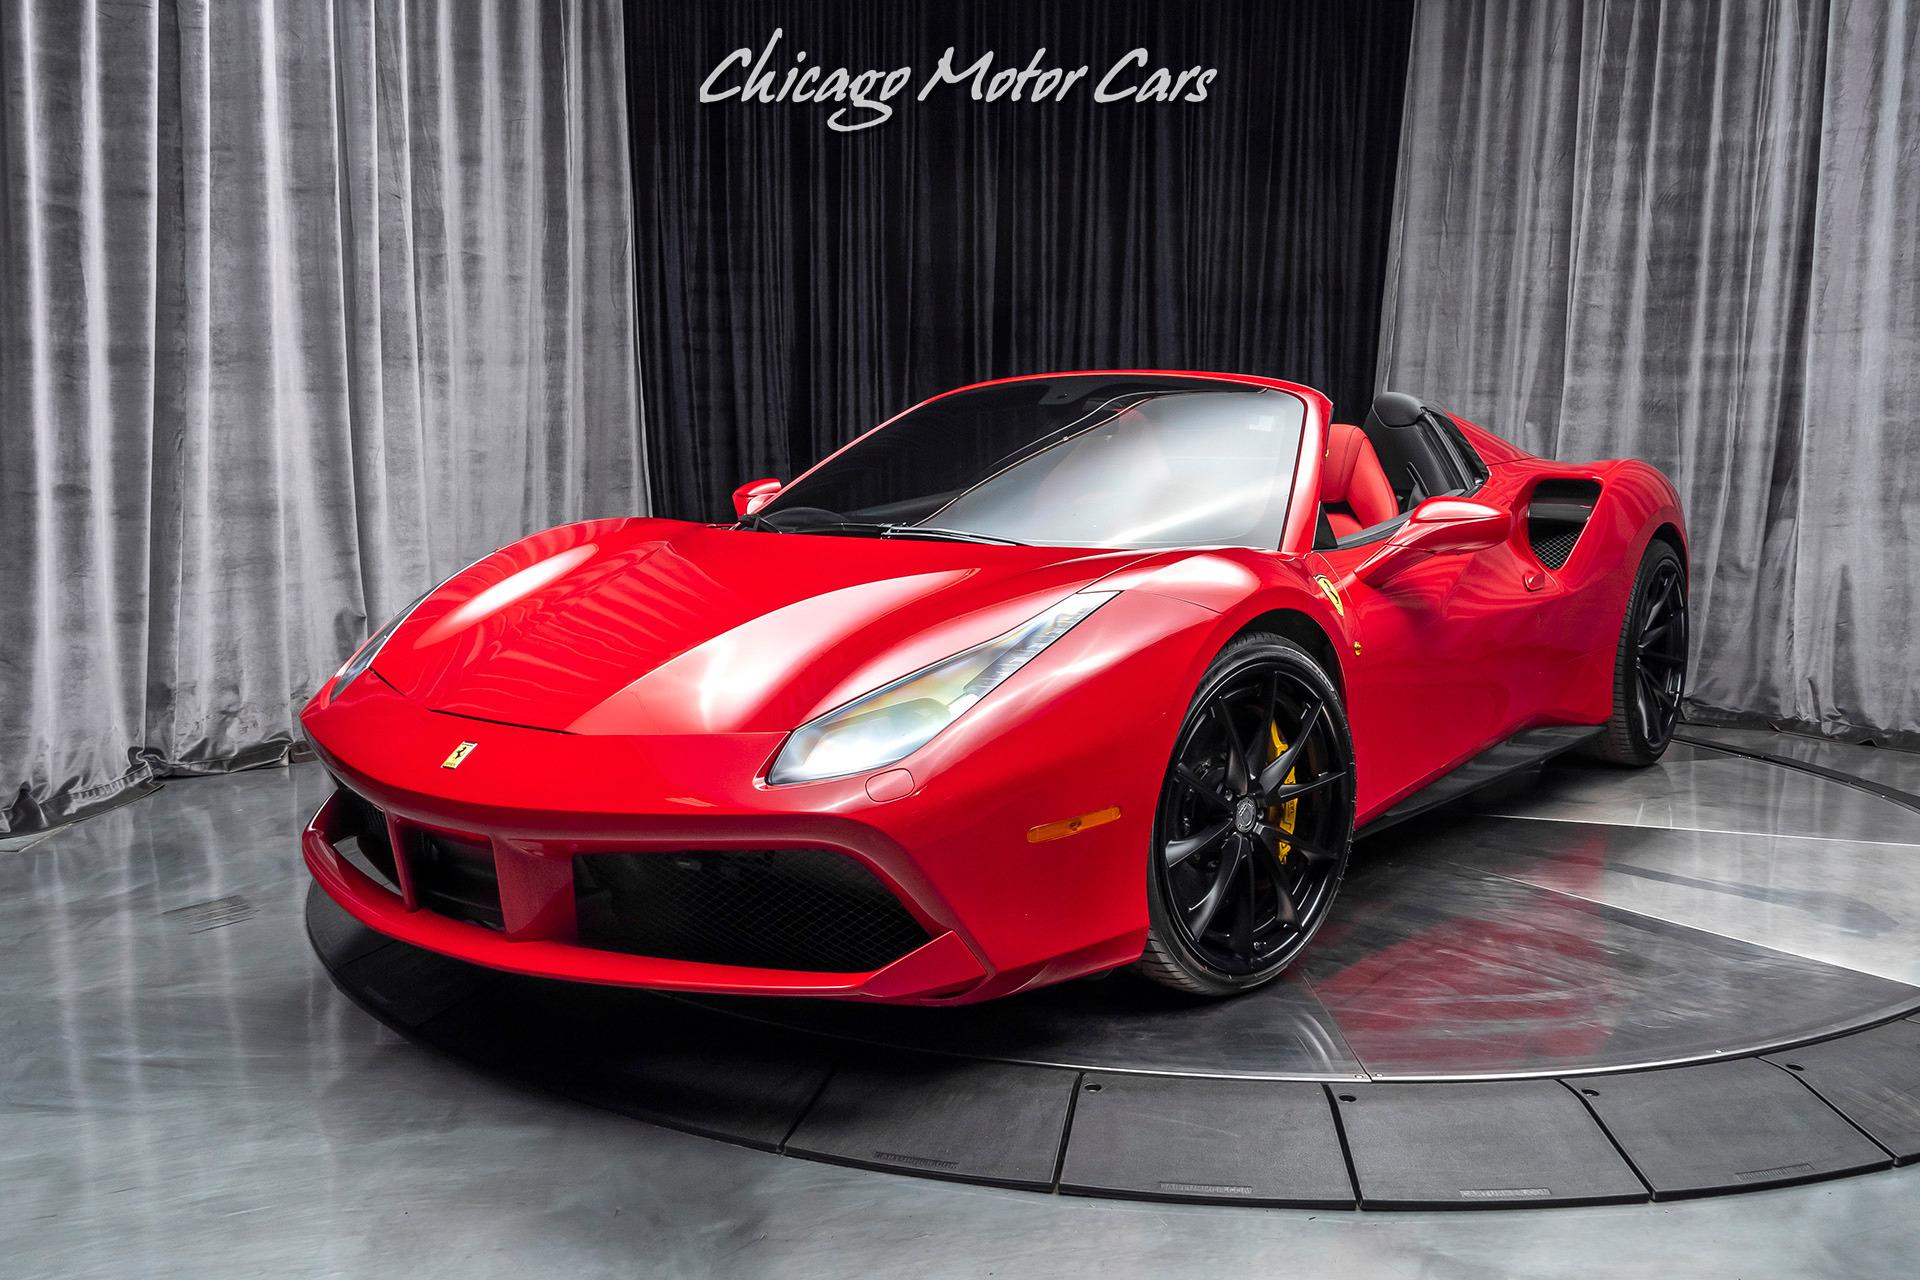 Used-2018-Ferrari-488-Spider-Convertible-2122-HRE-PERFORMANCE-WHEELS-CARBON-FIBER-SPORT-EXHAUST